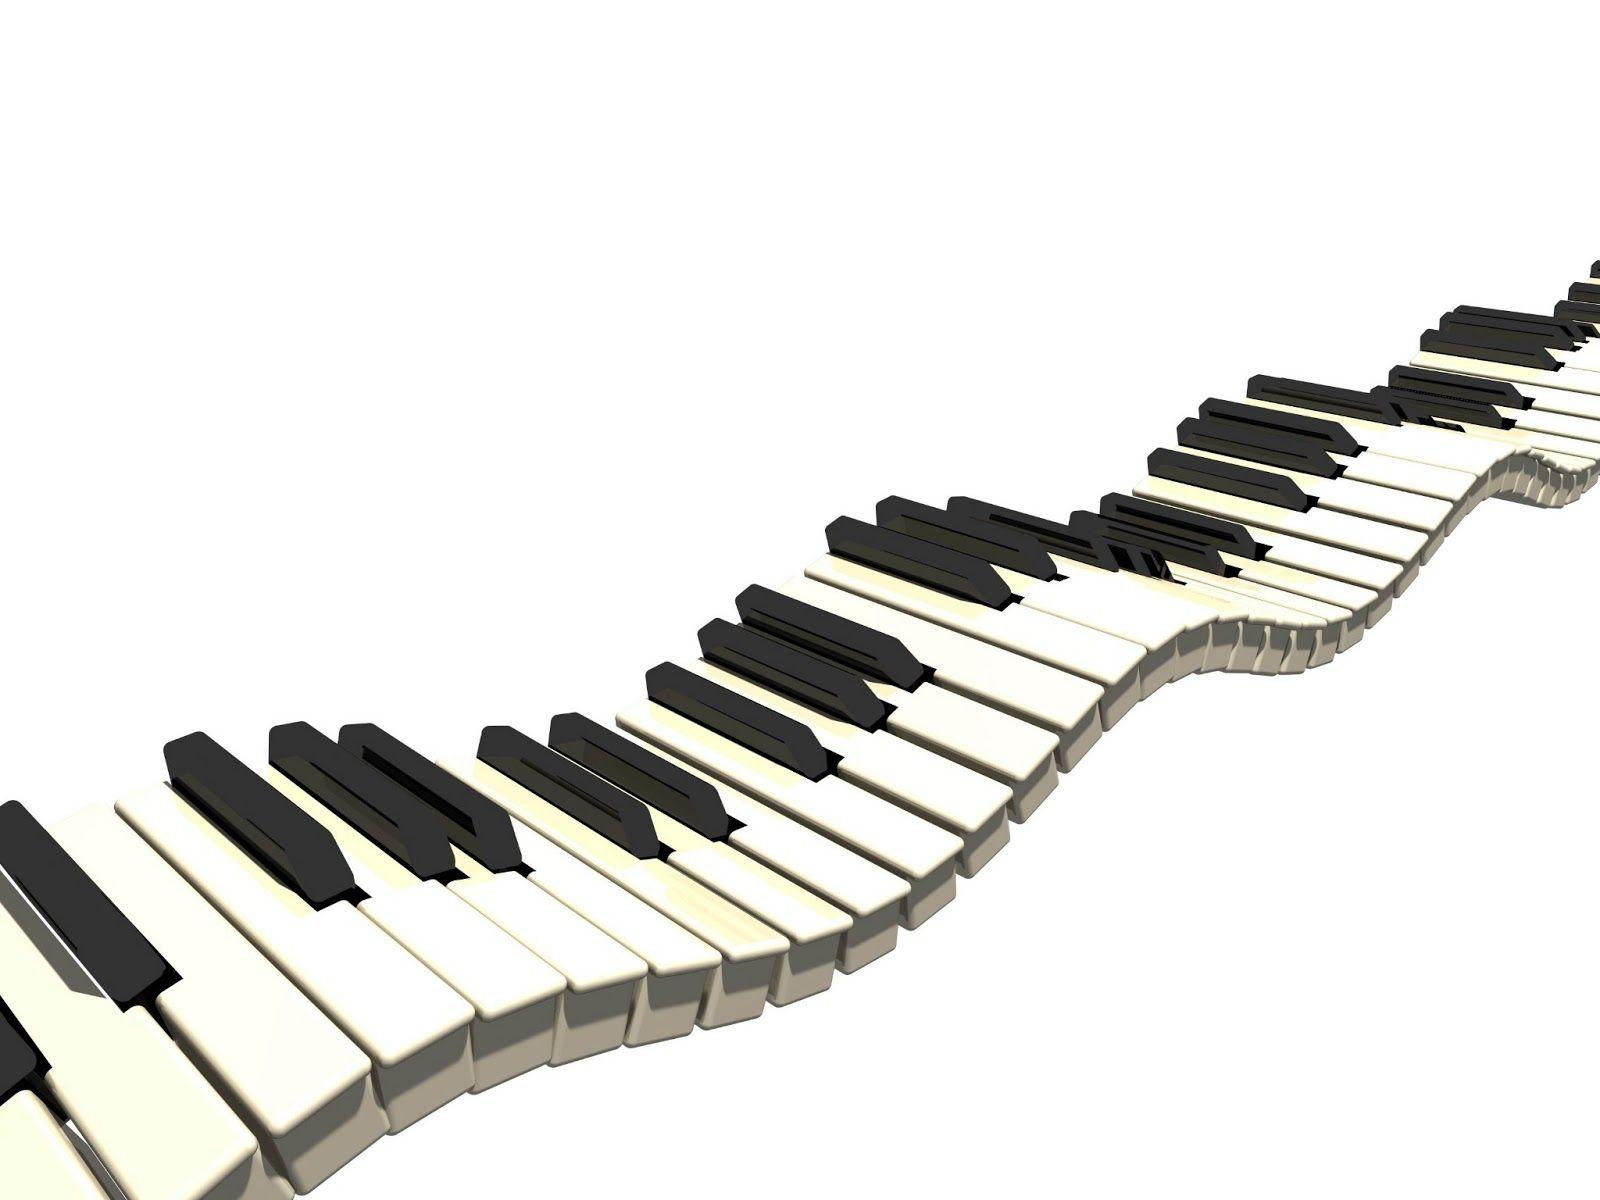 Piano Wallpapers 500 Collection Hd Wallpaper Piano Piano Art Piano Keys